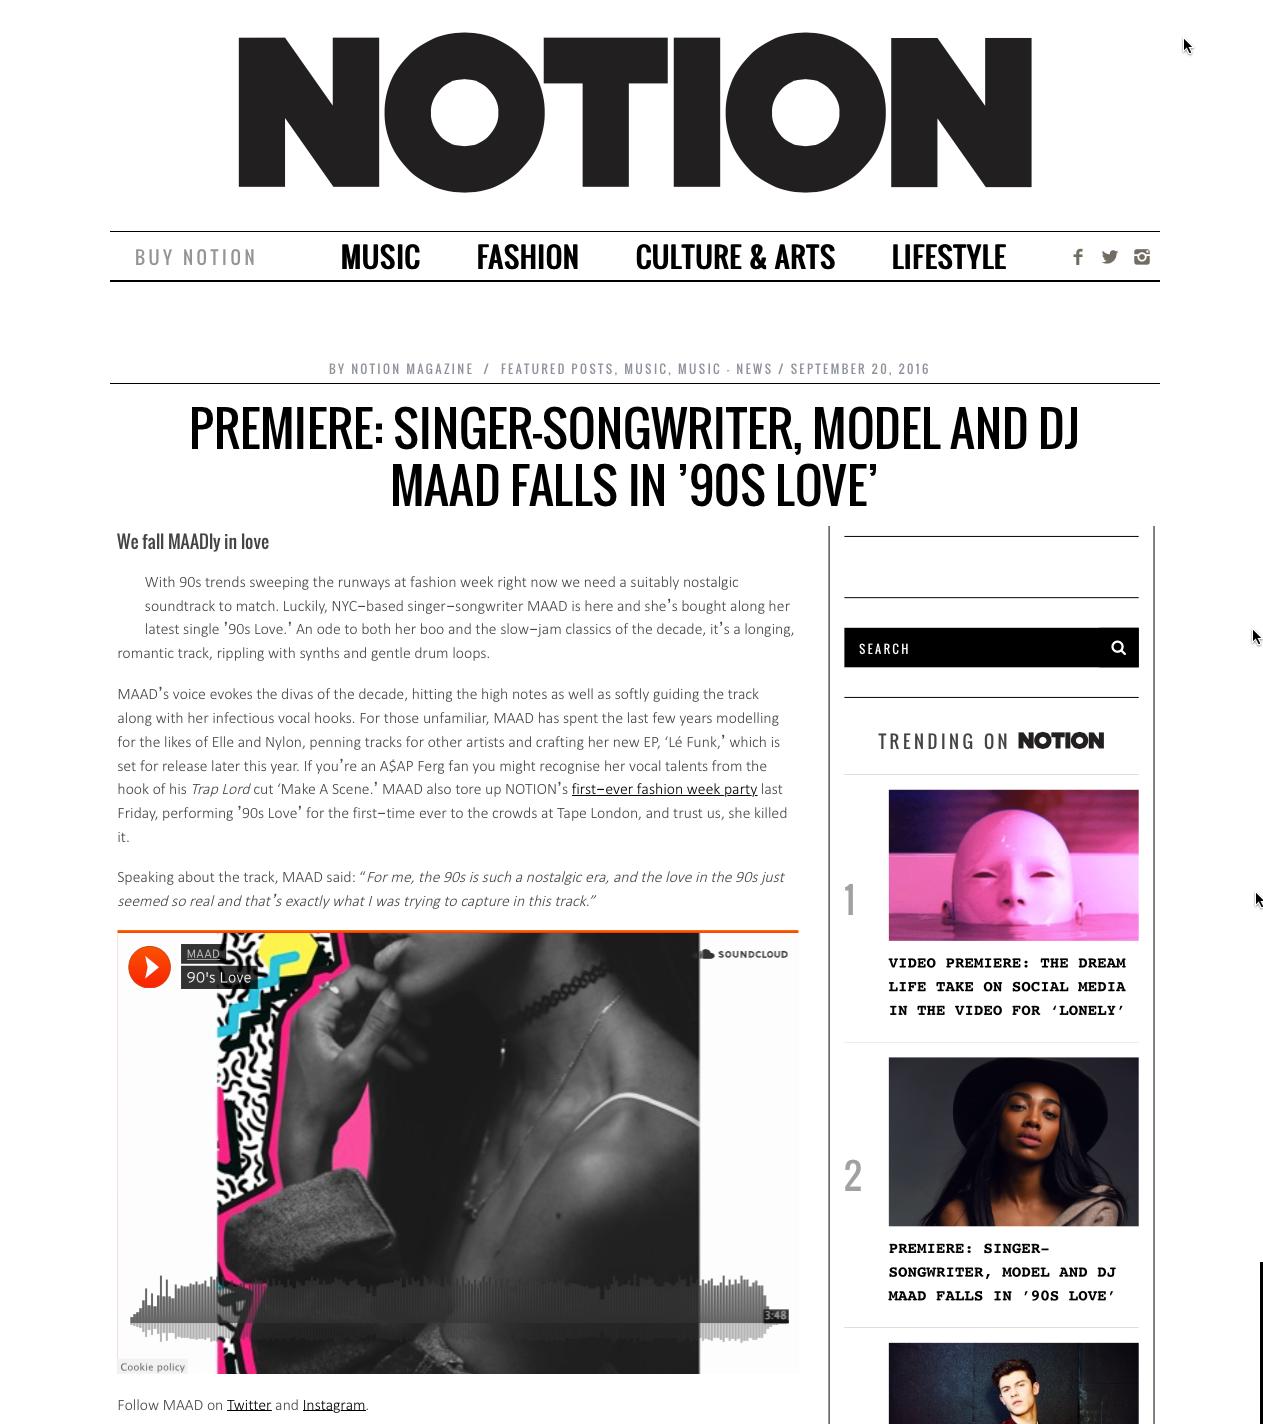 notion premiere.png